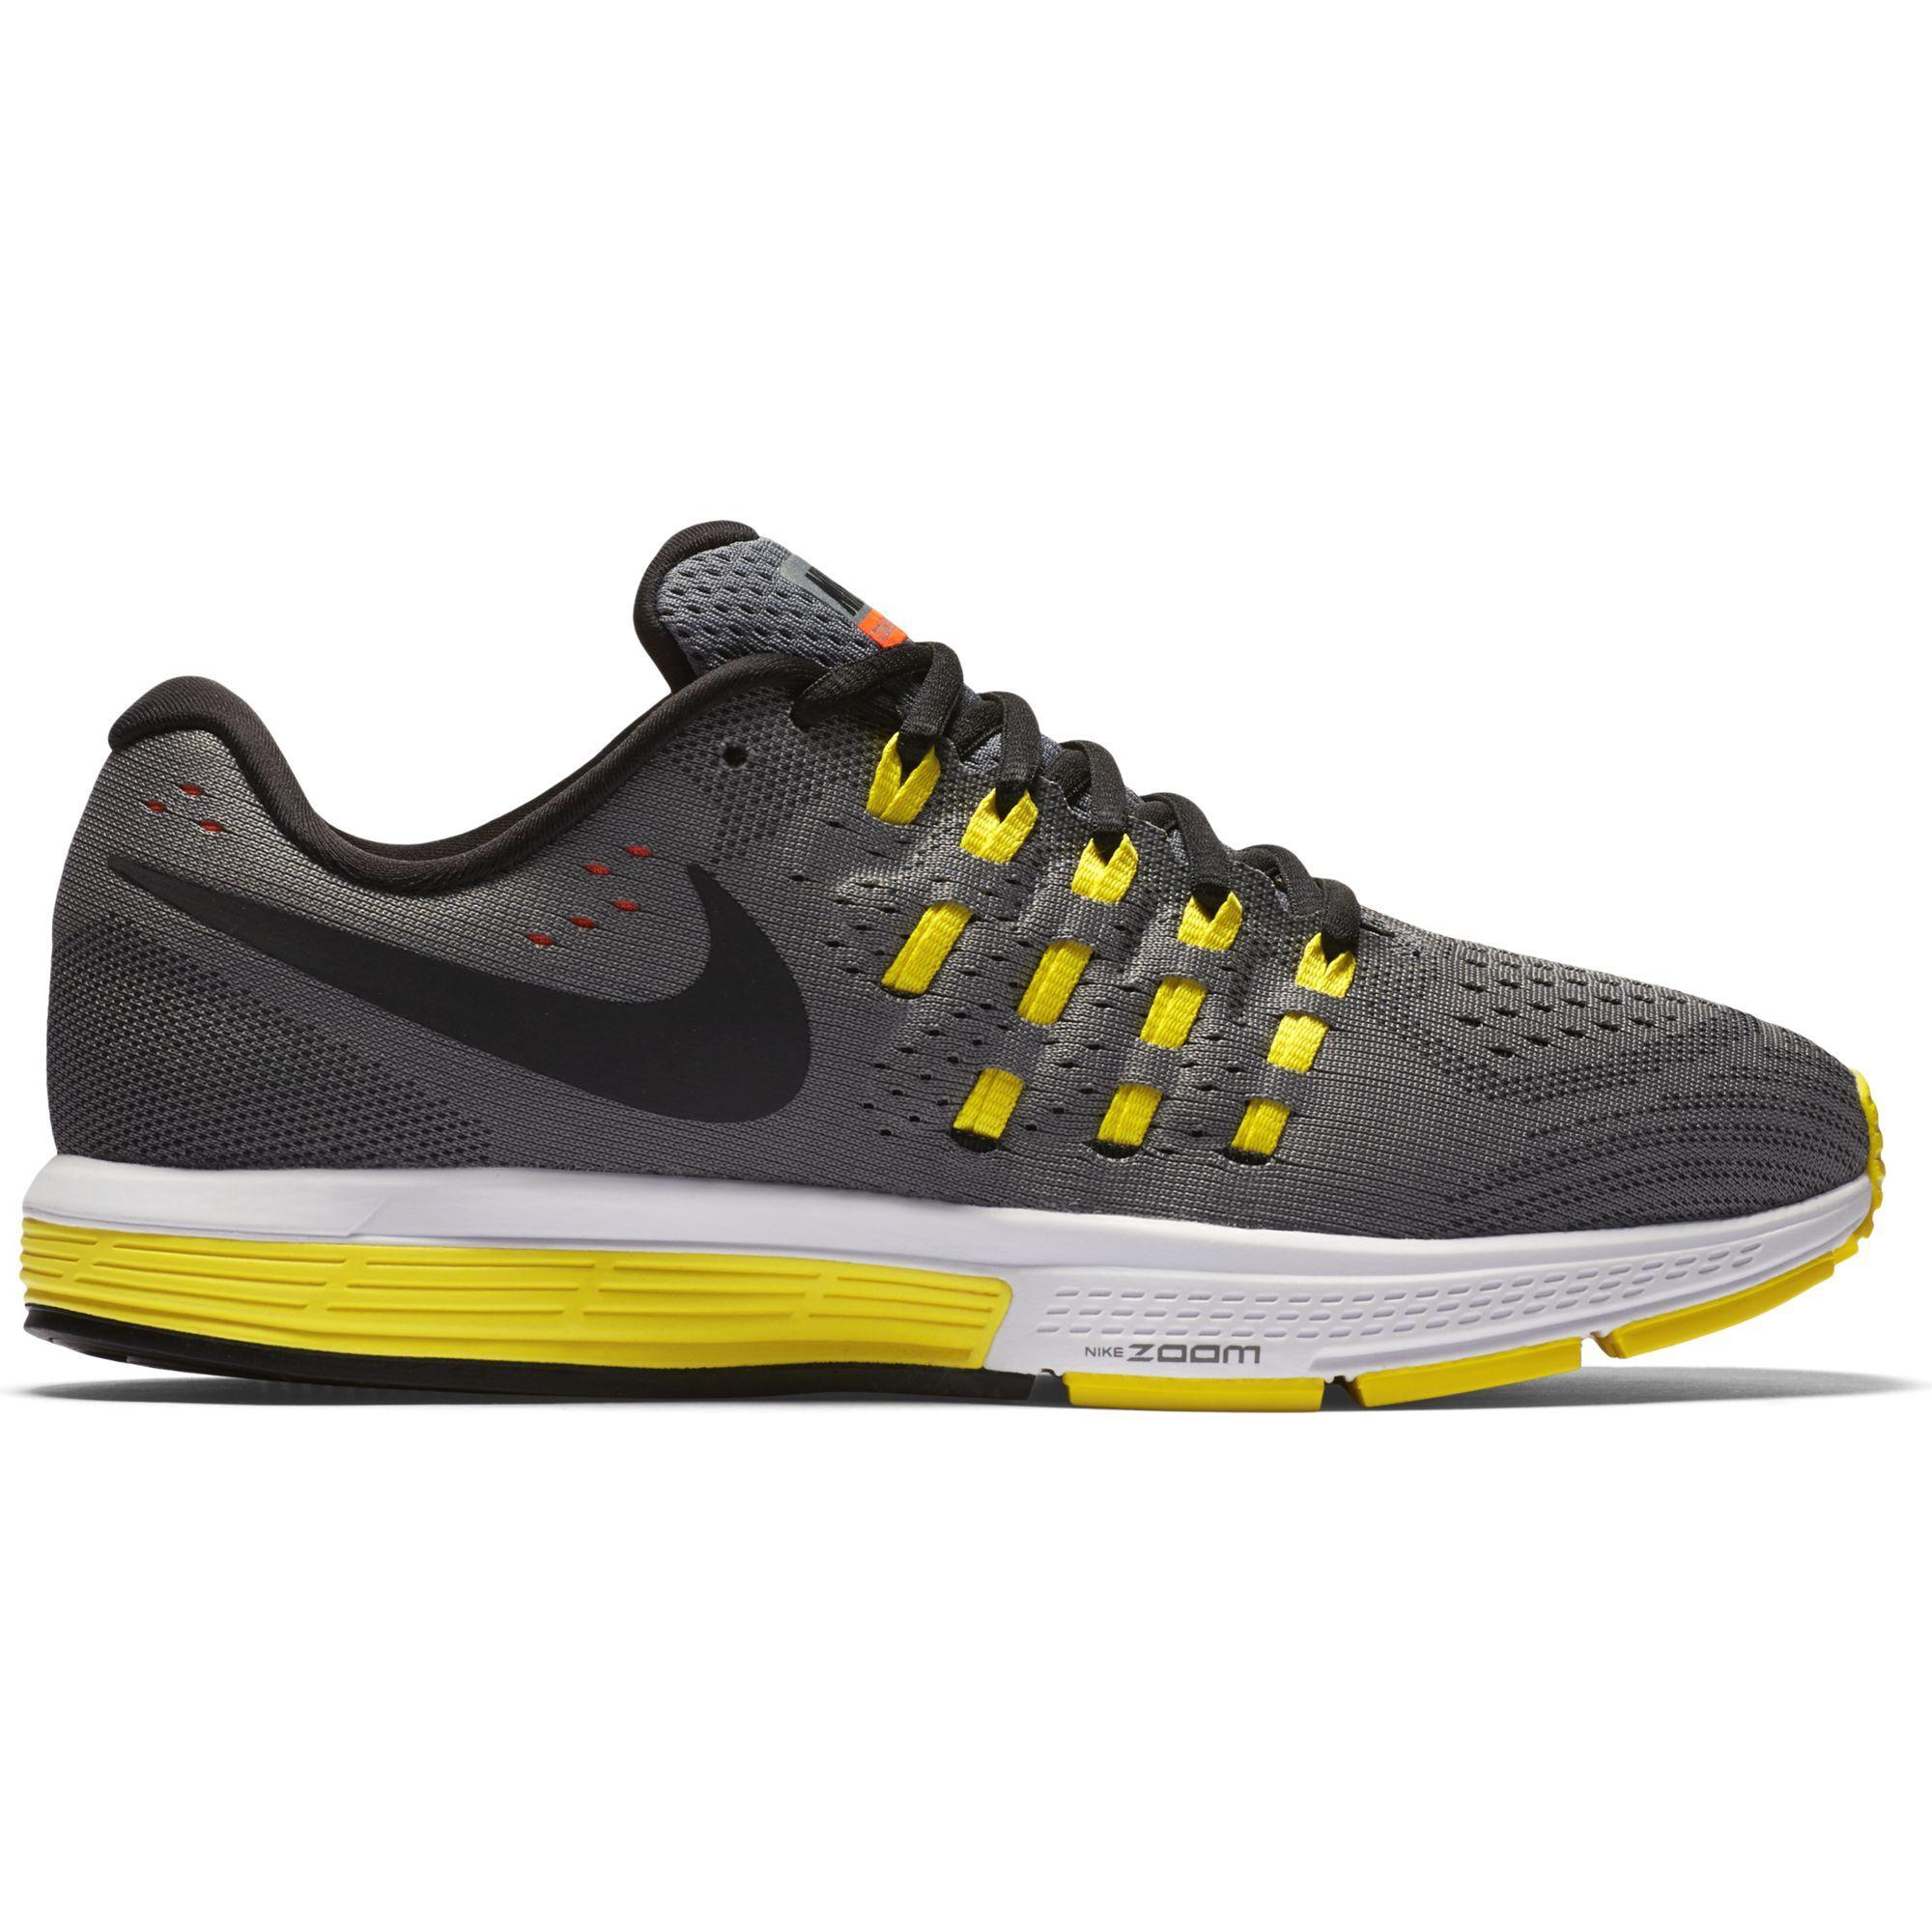 ... basketball shoes; women s nike air zoom vomero 11 fleet feet sports ...